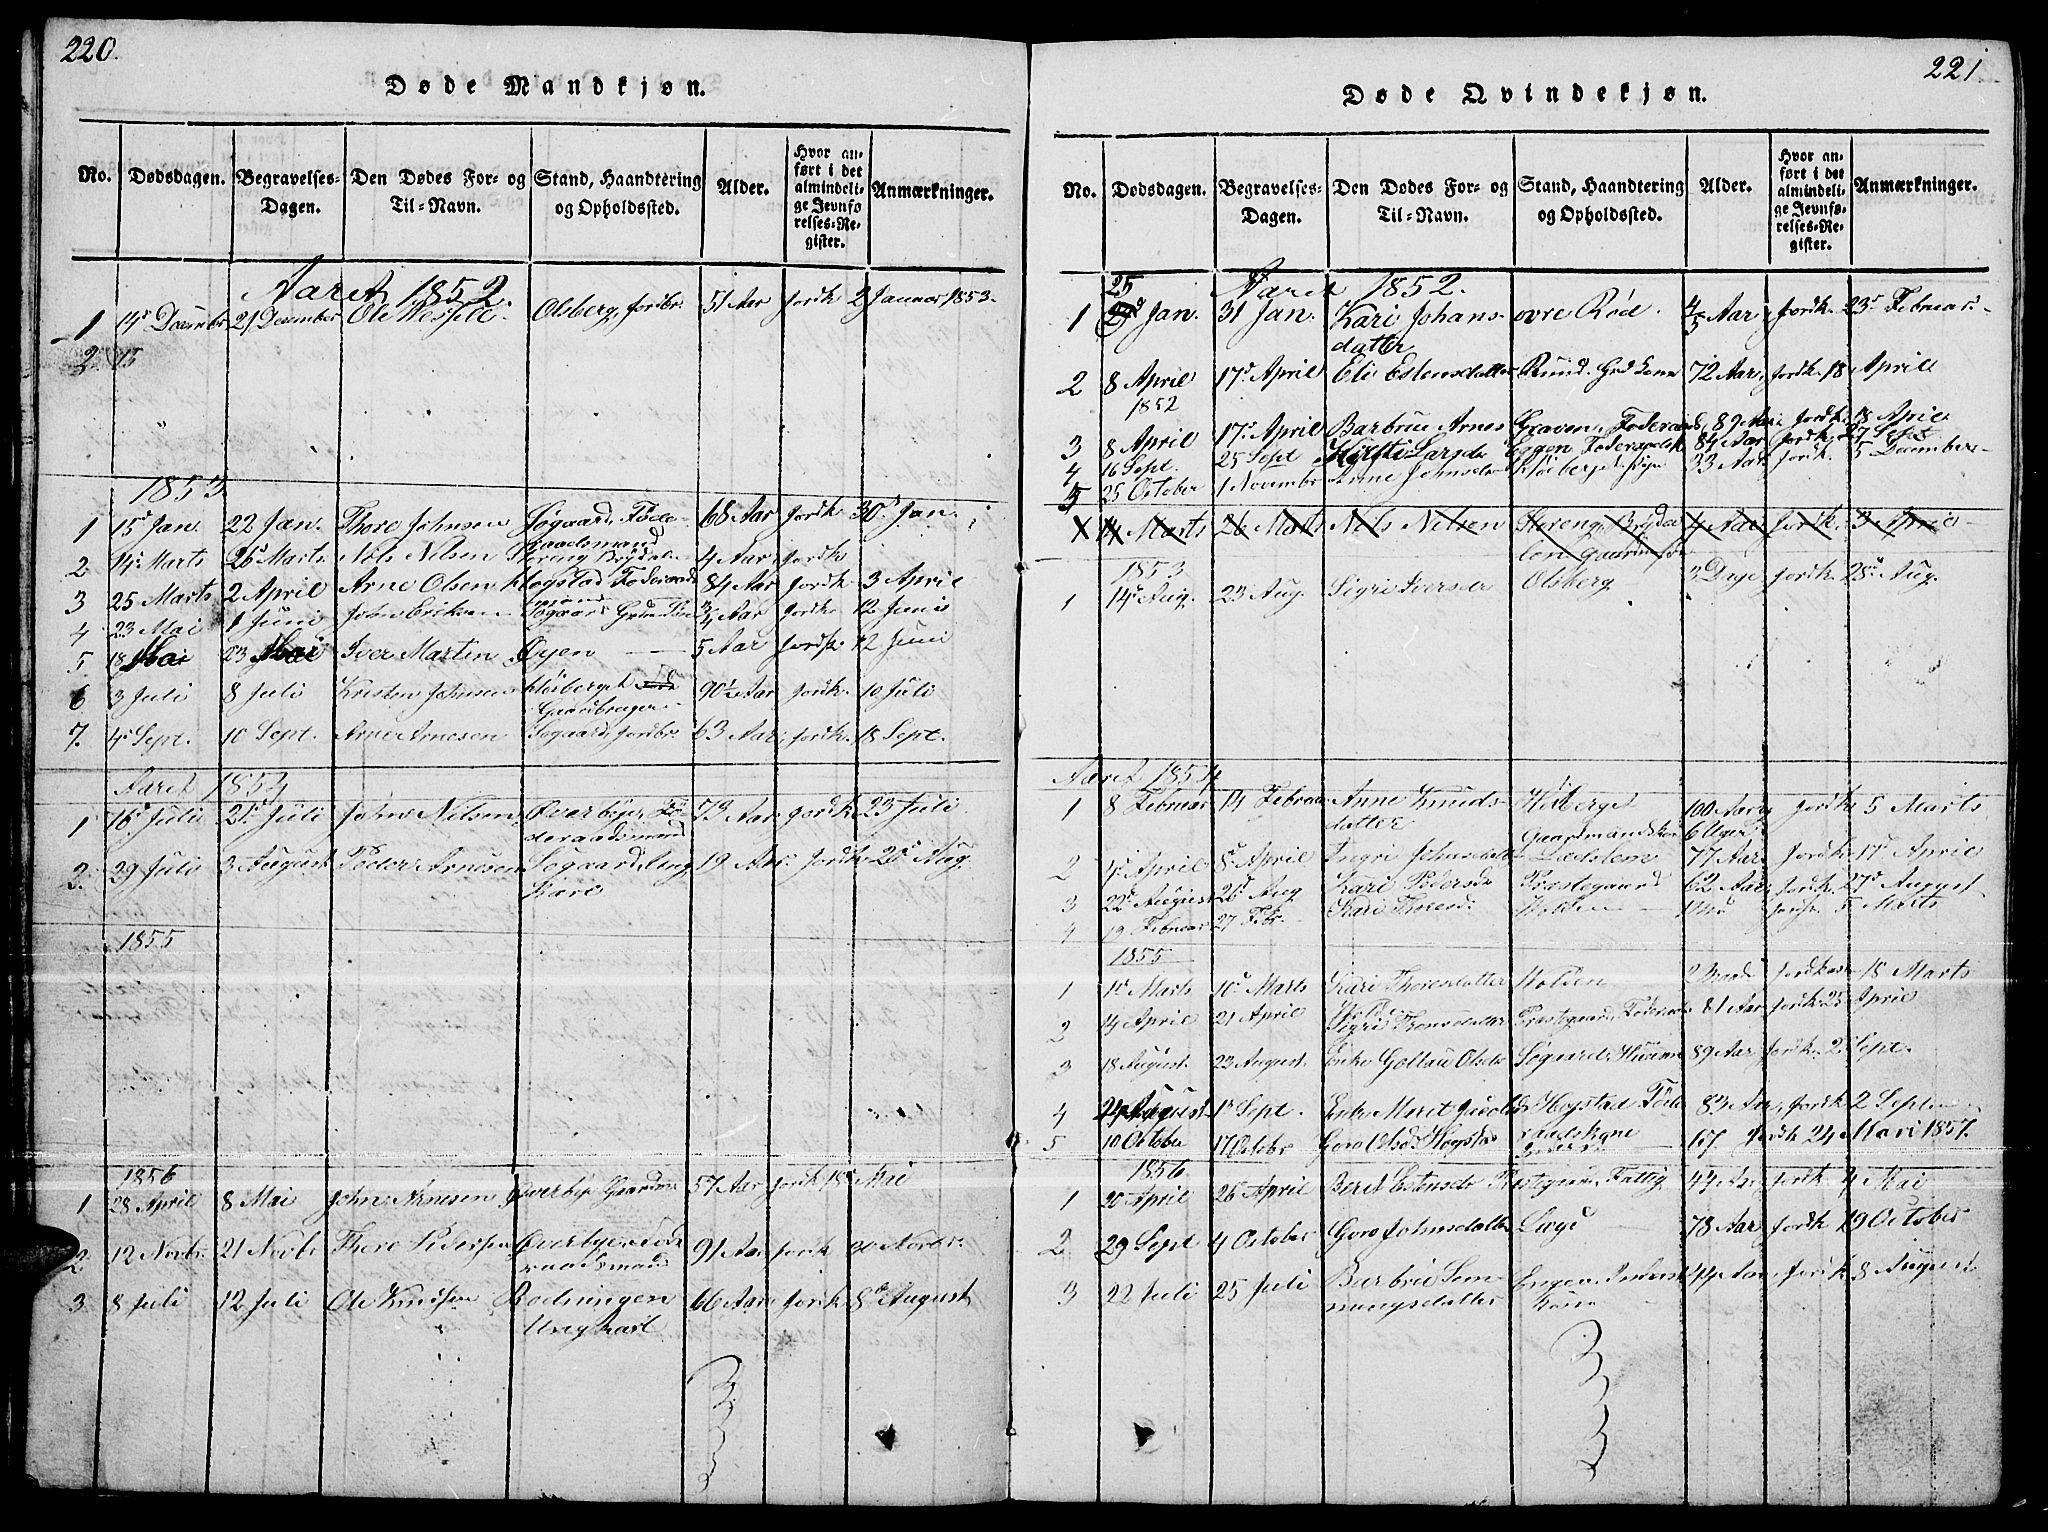 SAH, Tynset prestekontor, Parish register (copy) no. 4, 1814-1879, p. 220-221